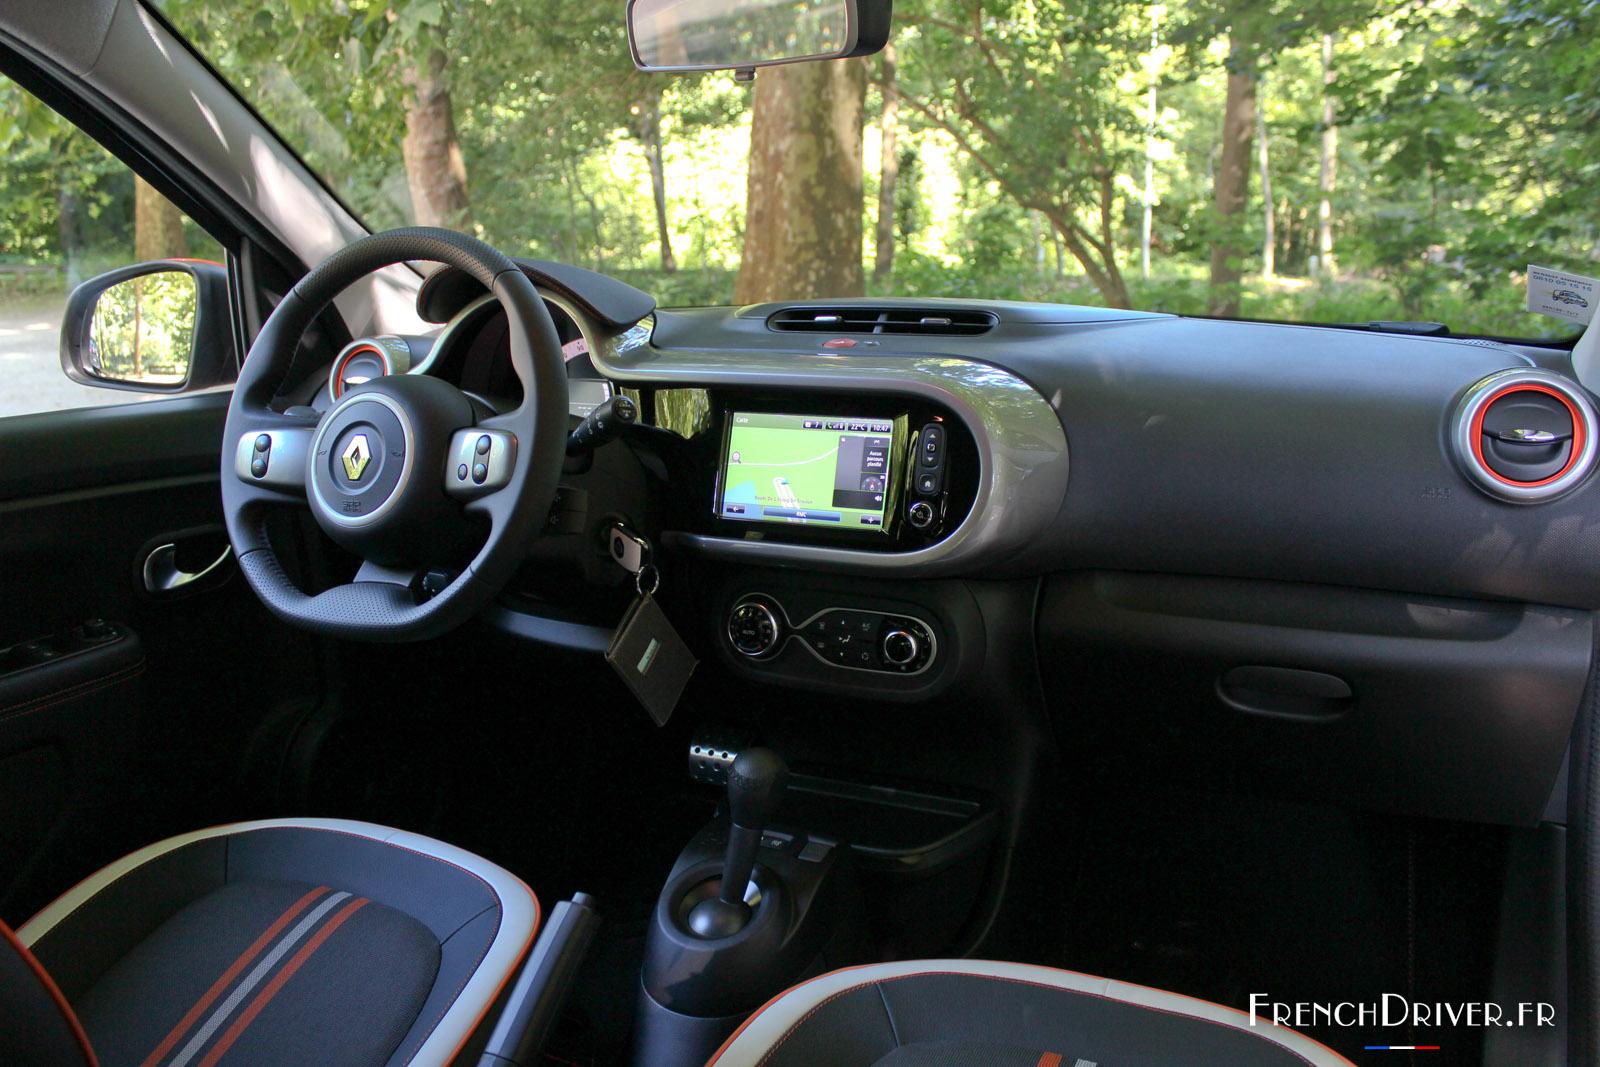 Essai Renault Twingo GT EDC : petite citadine énervée - French Driver